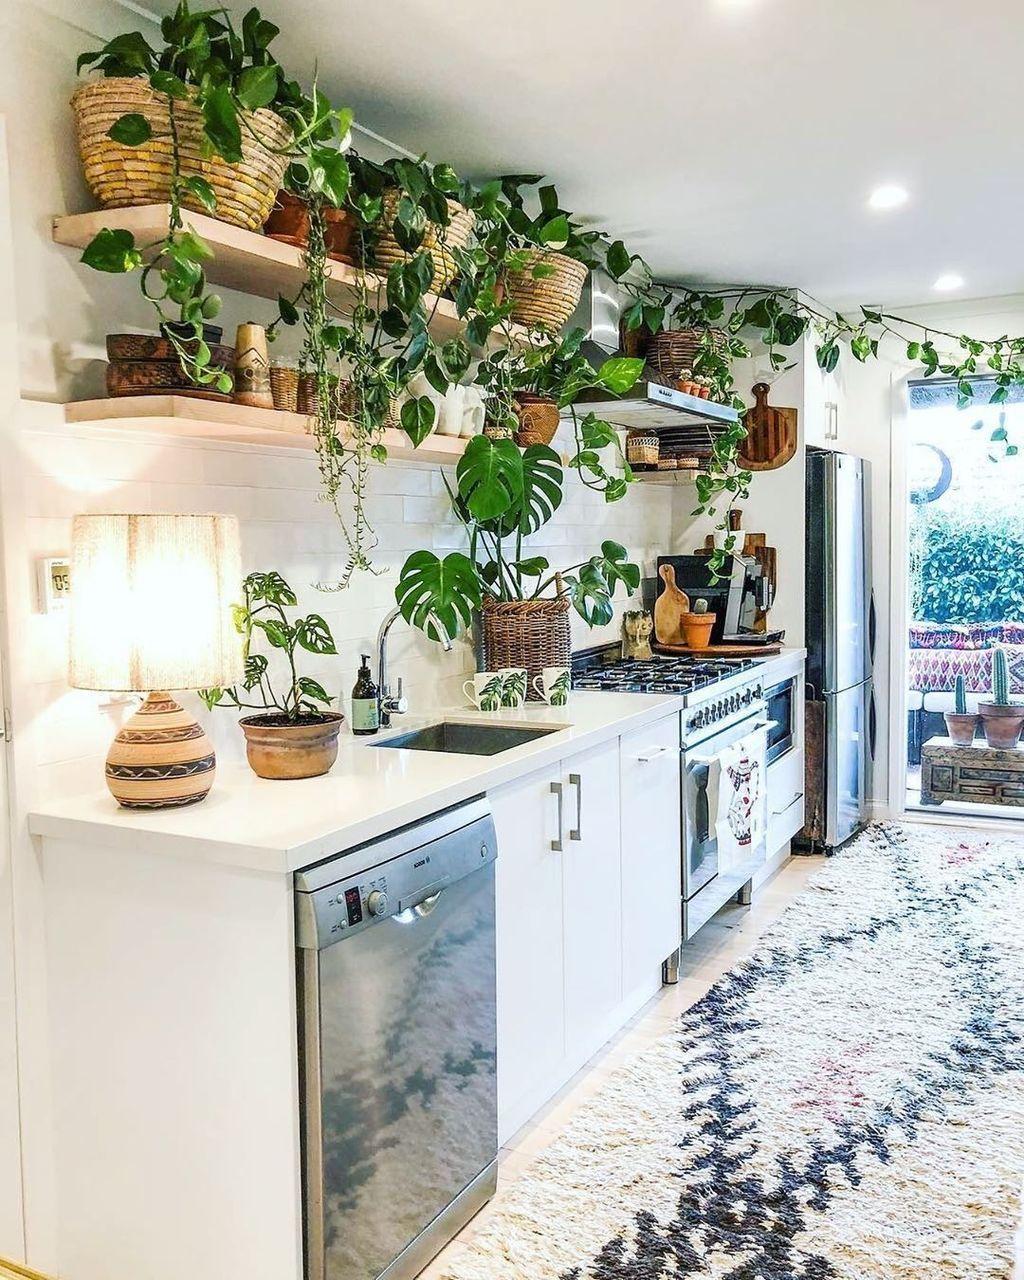 36 lovely bohemian kitchen decor ideas that you will like bohemian kitchen decor bohemian on boho chic kitchen table ideas id=46385